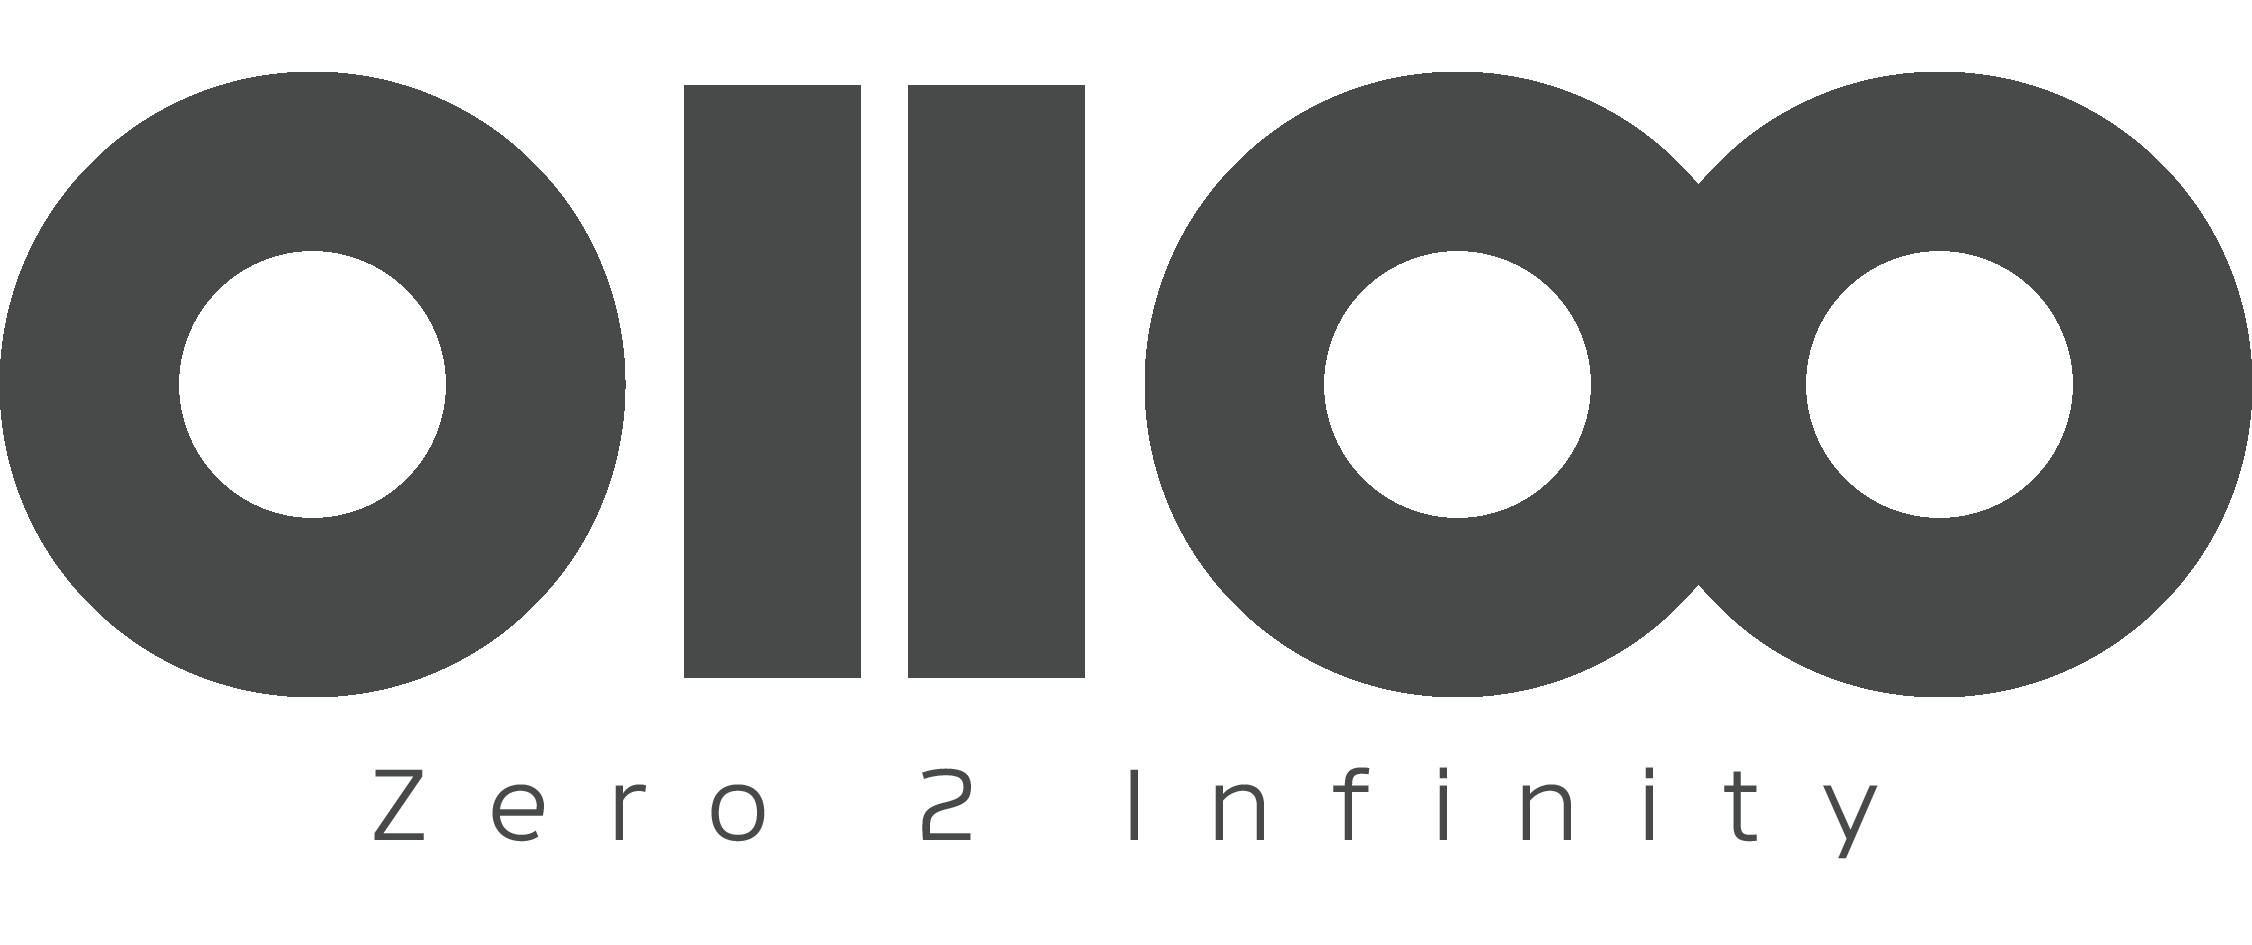 zero 2 infinity job board